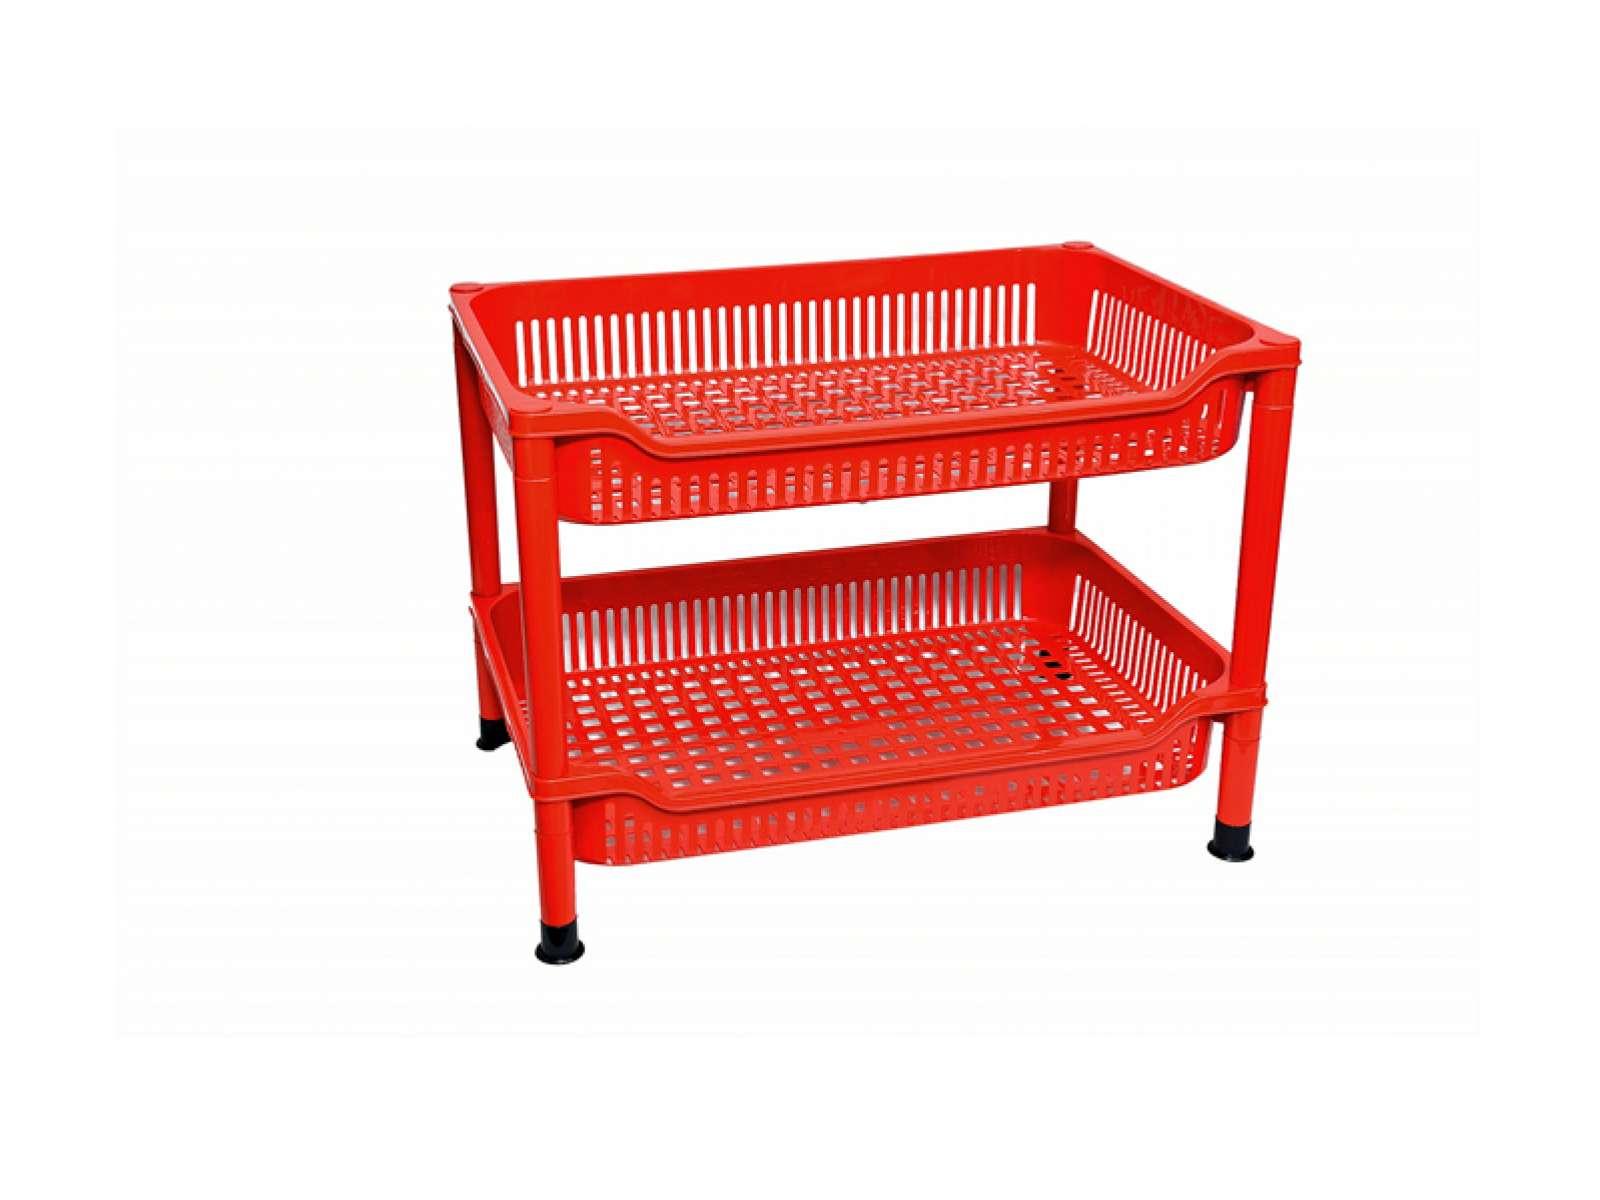 2-Tier Shelf - Large